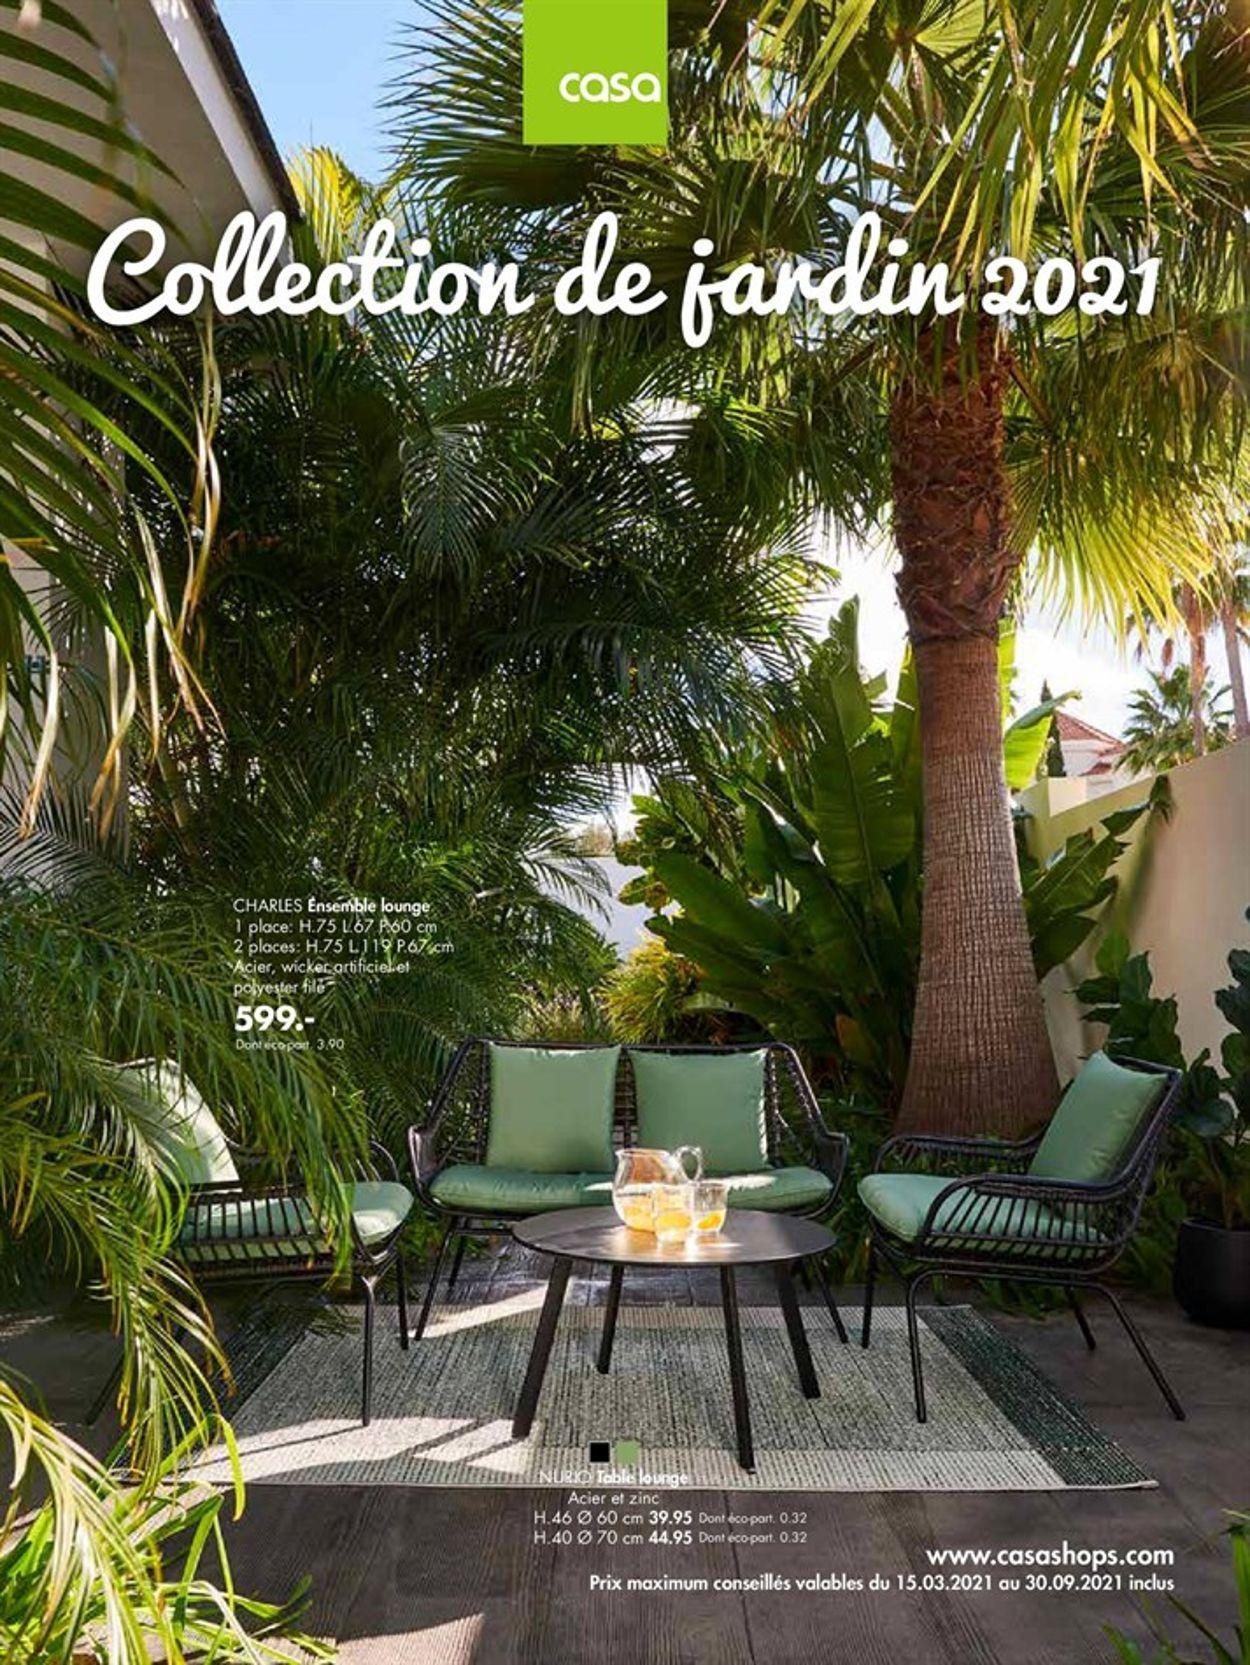 Casa Catalogue - 15.03-30.09.2021